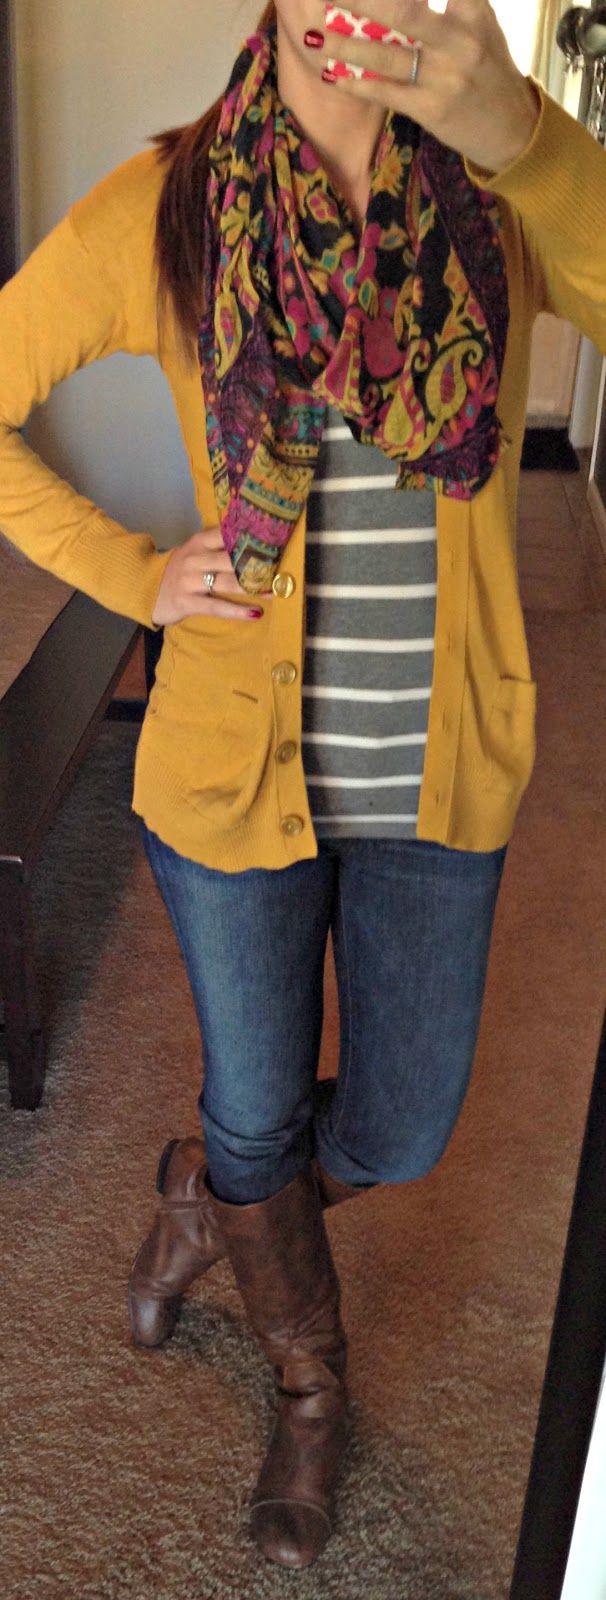 mustard yellow cardigan-don't love the scarf.